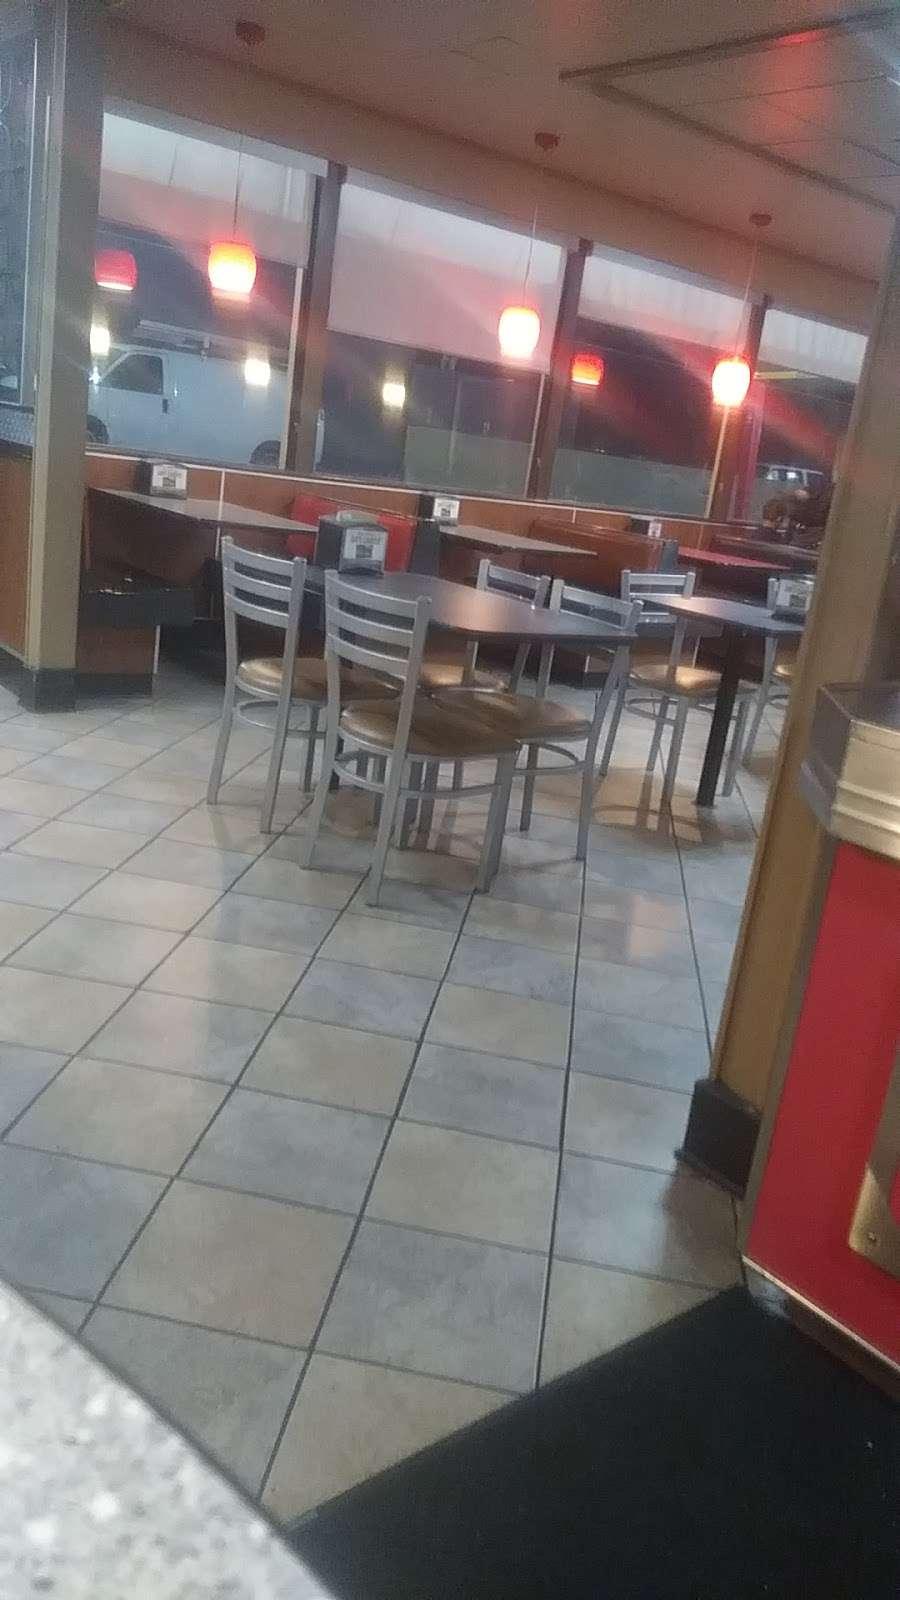 Carls Jr. - restaurant  | Photo 6 of 10 | Address: 18756 Sherman Way, Reseda, CA 91335, USA | Phone: (818) 881-8775